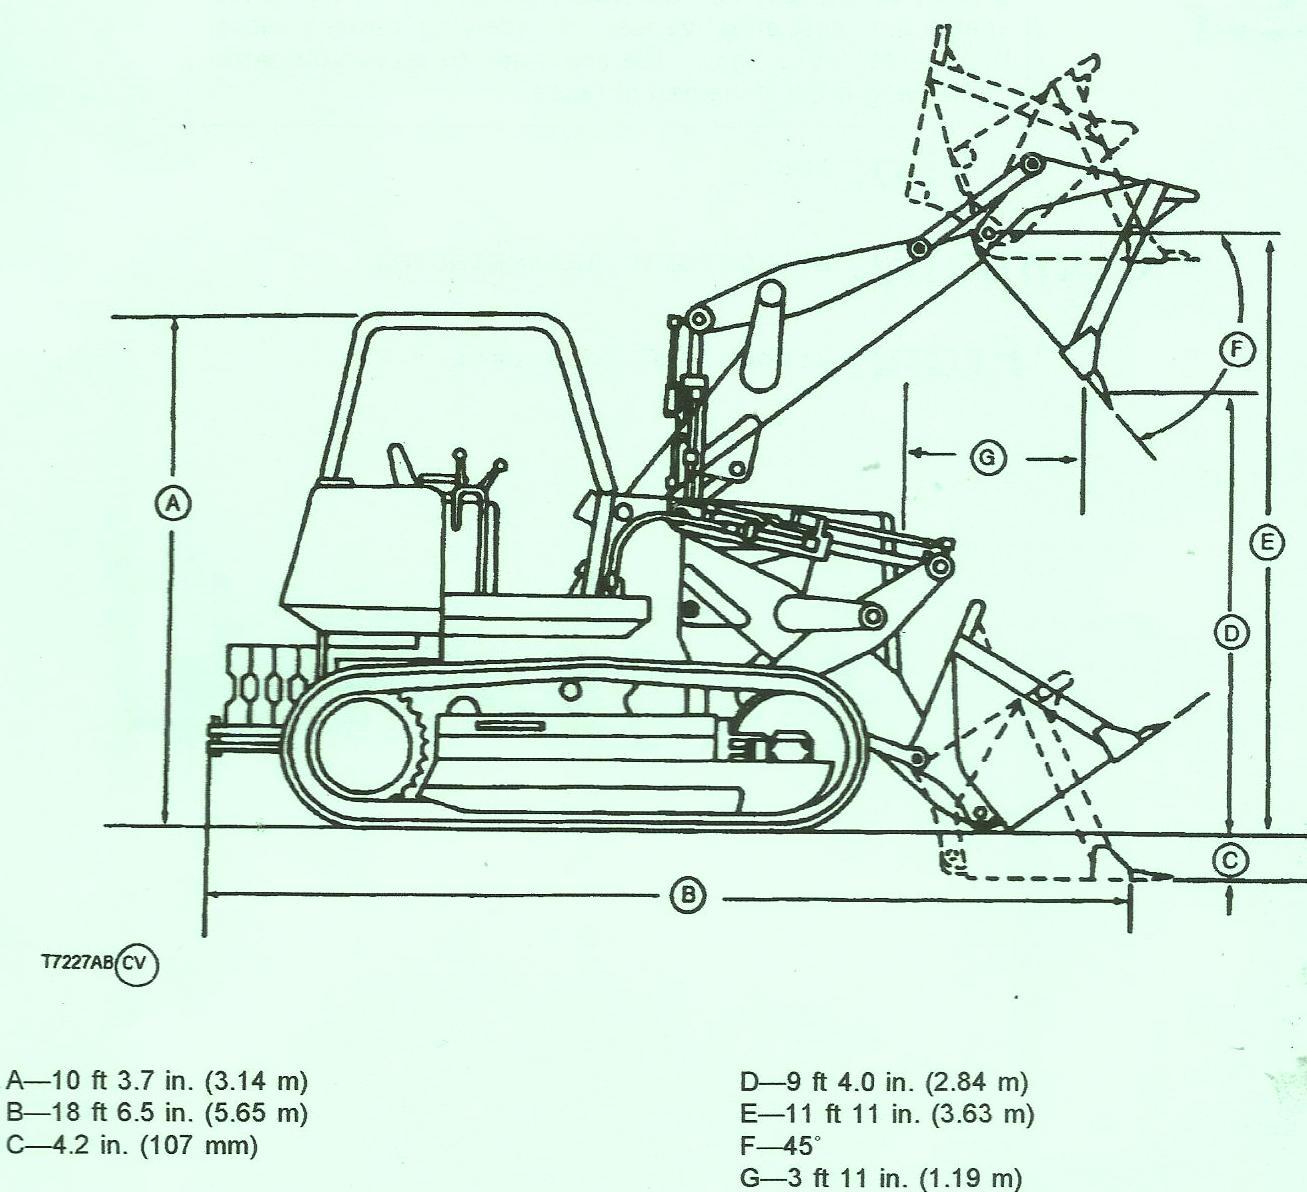 John Deere Crawler Loader 755B Specifications